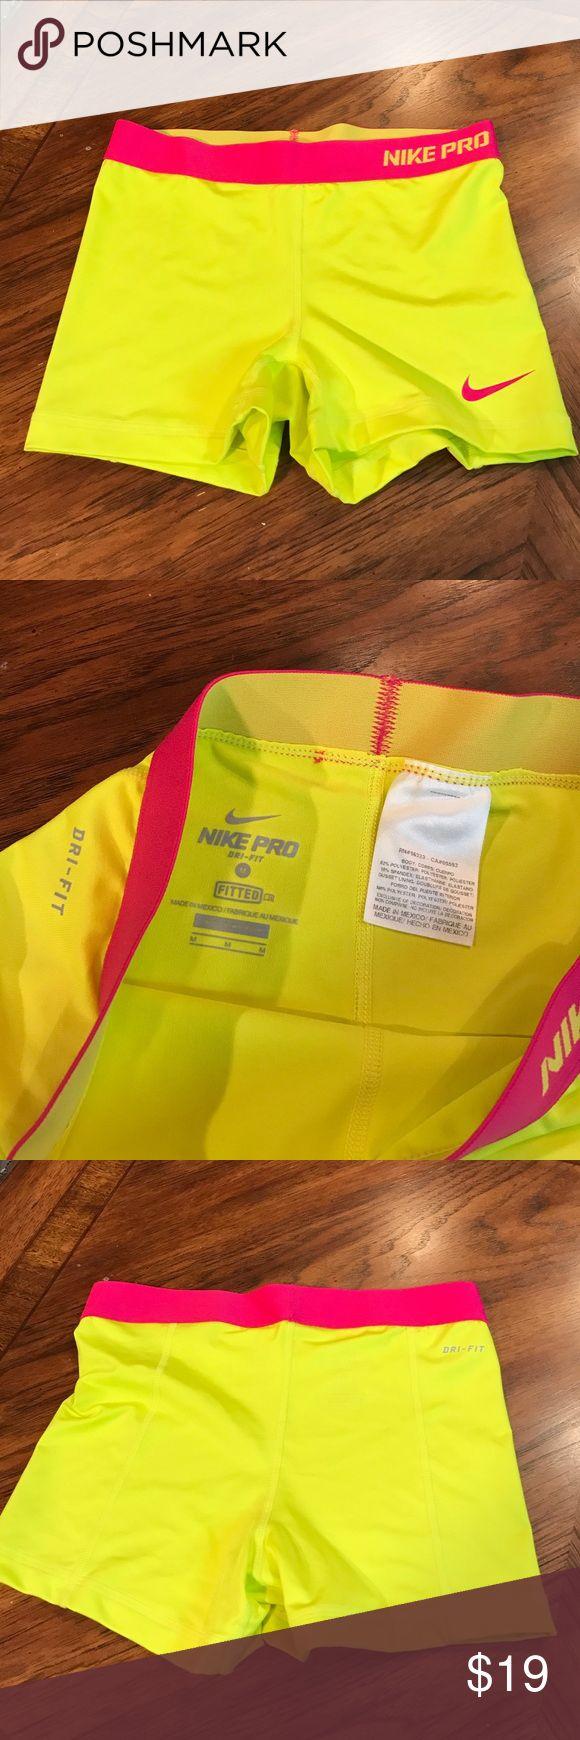 "Nike Pro szM spandex 3"" inseam spandex shorts... Excellent used condition Nike Pro szM spandex 3"" inseam spandex shorts... Nike Shorts"